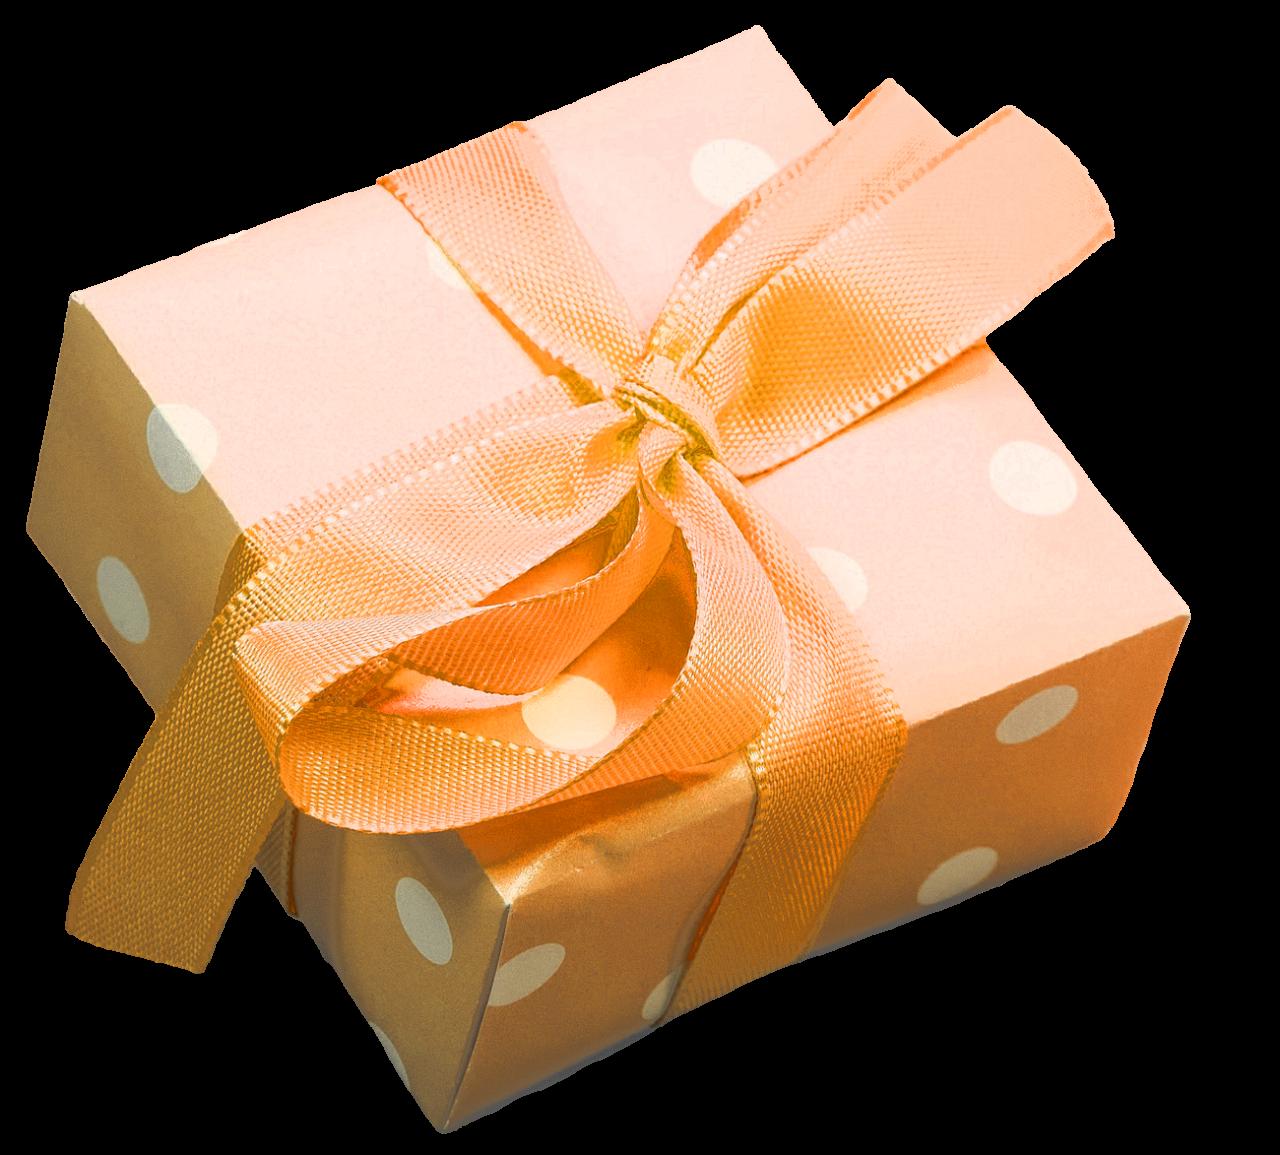 Tiny Present Box PNG Image